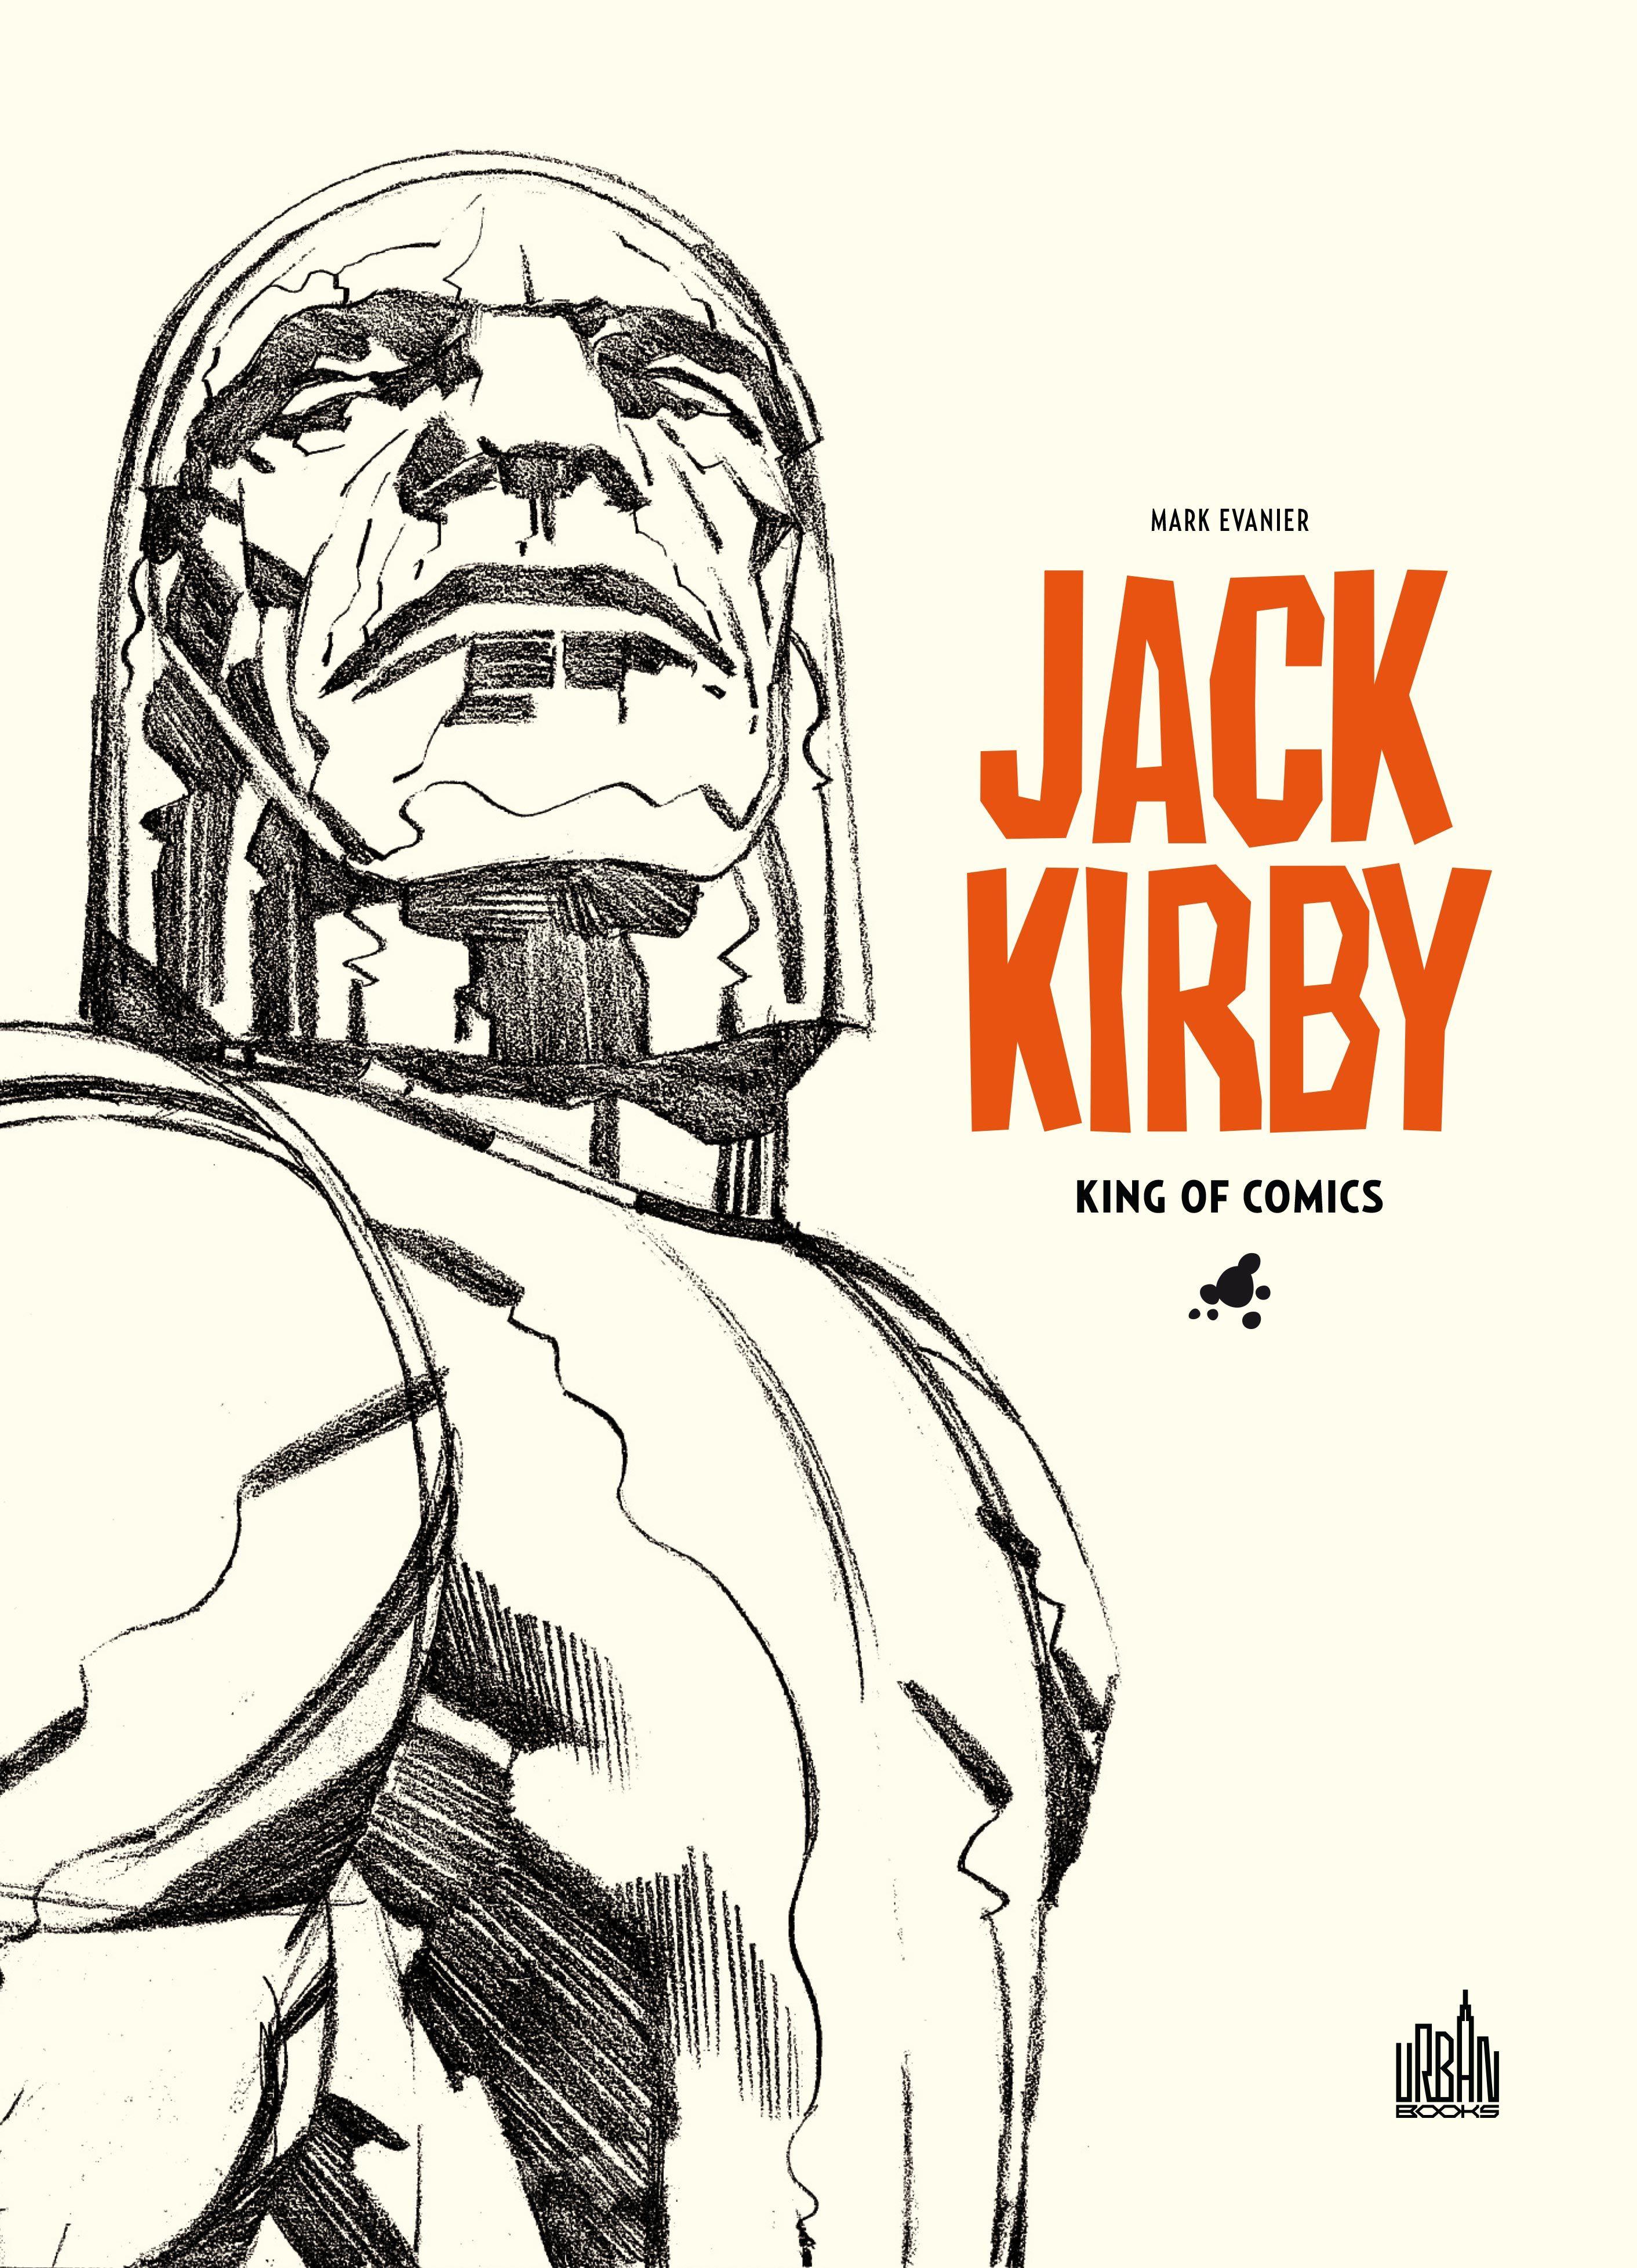 JACK KIRBY, KING OF COMICS PAR MARK EVANIER